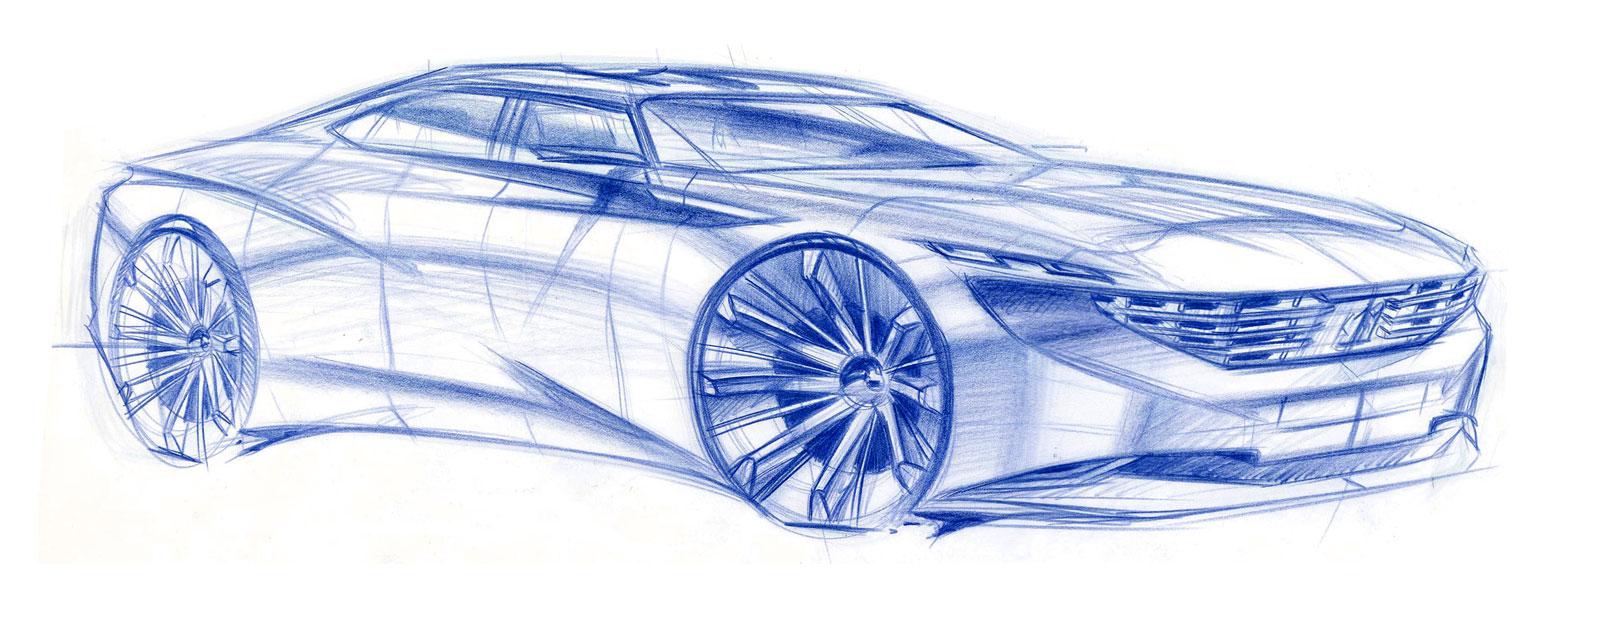 Peugeot Exalt Design Sketch Car Body Design